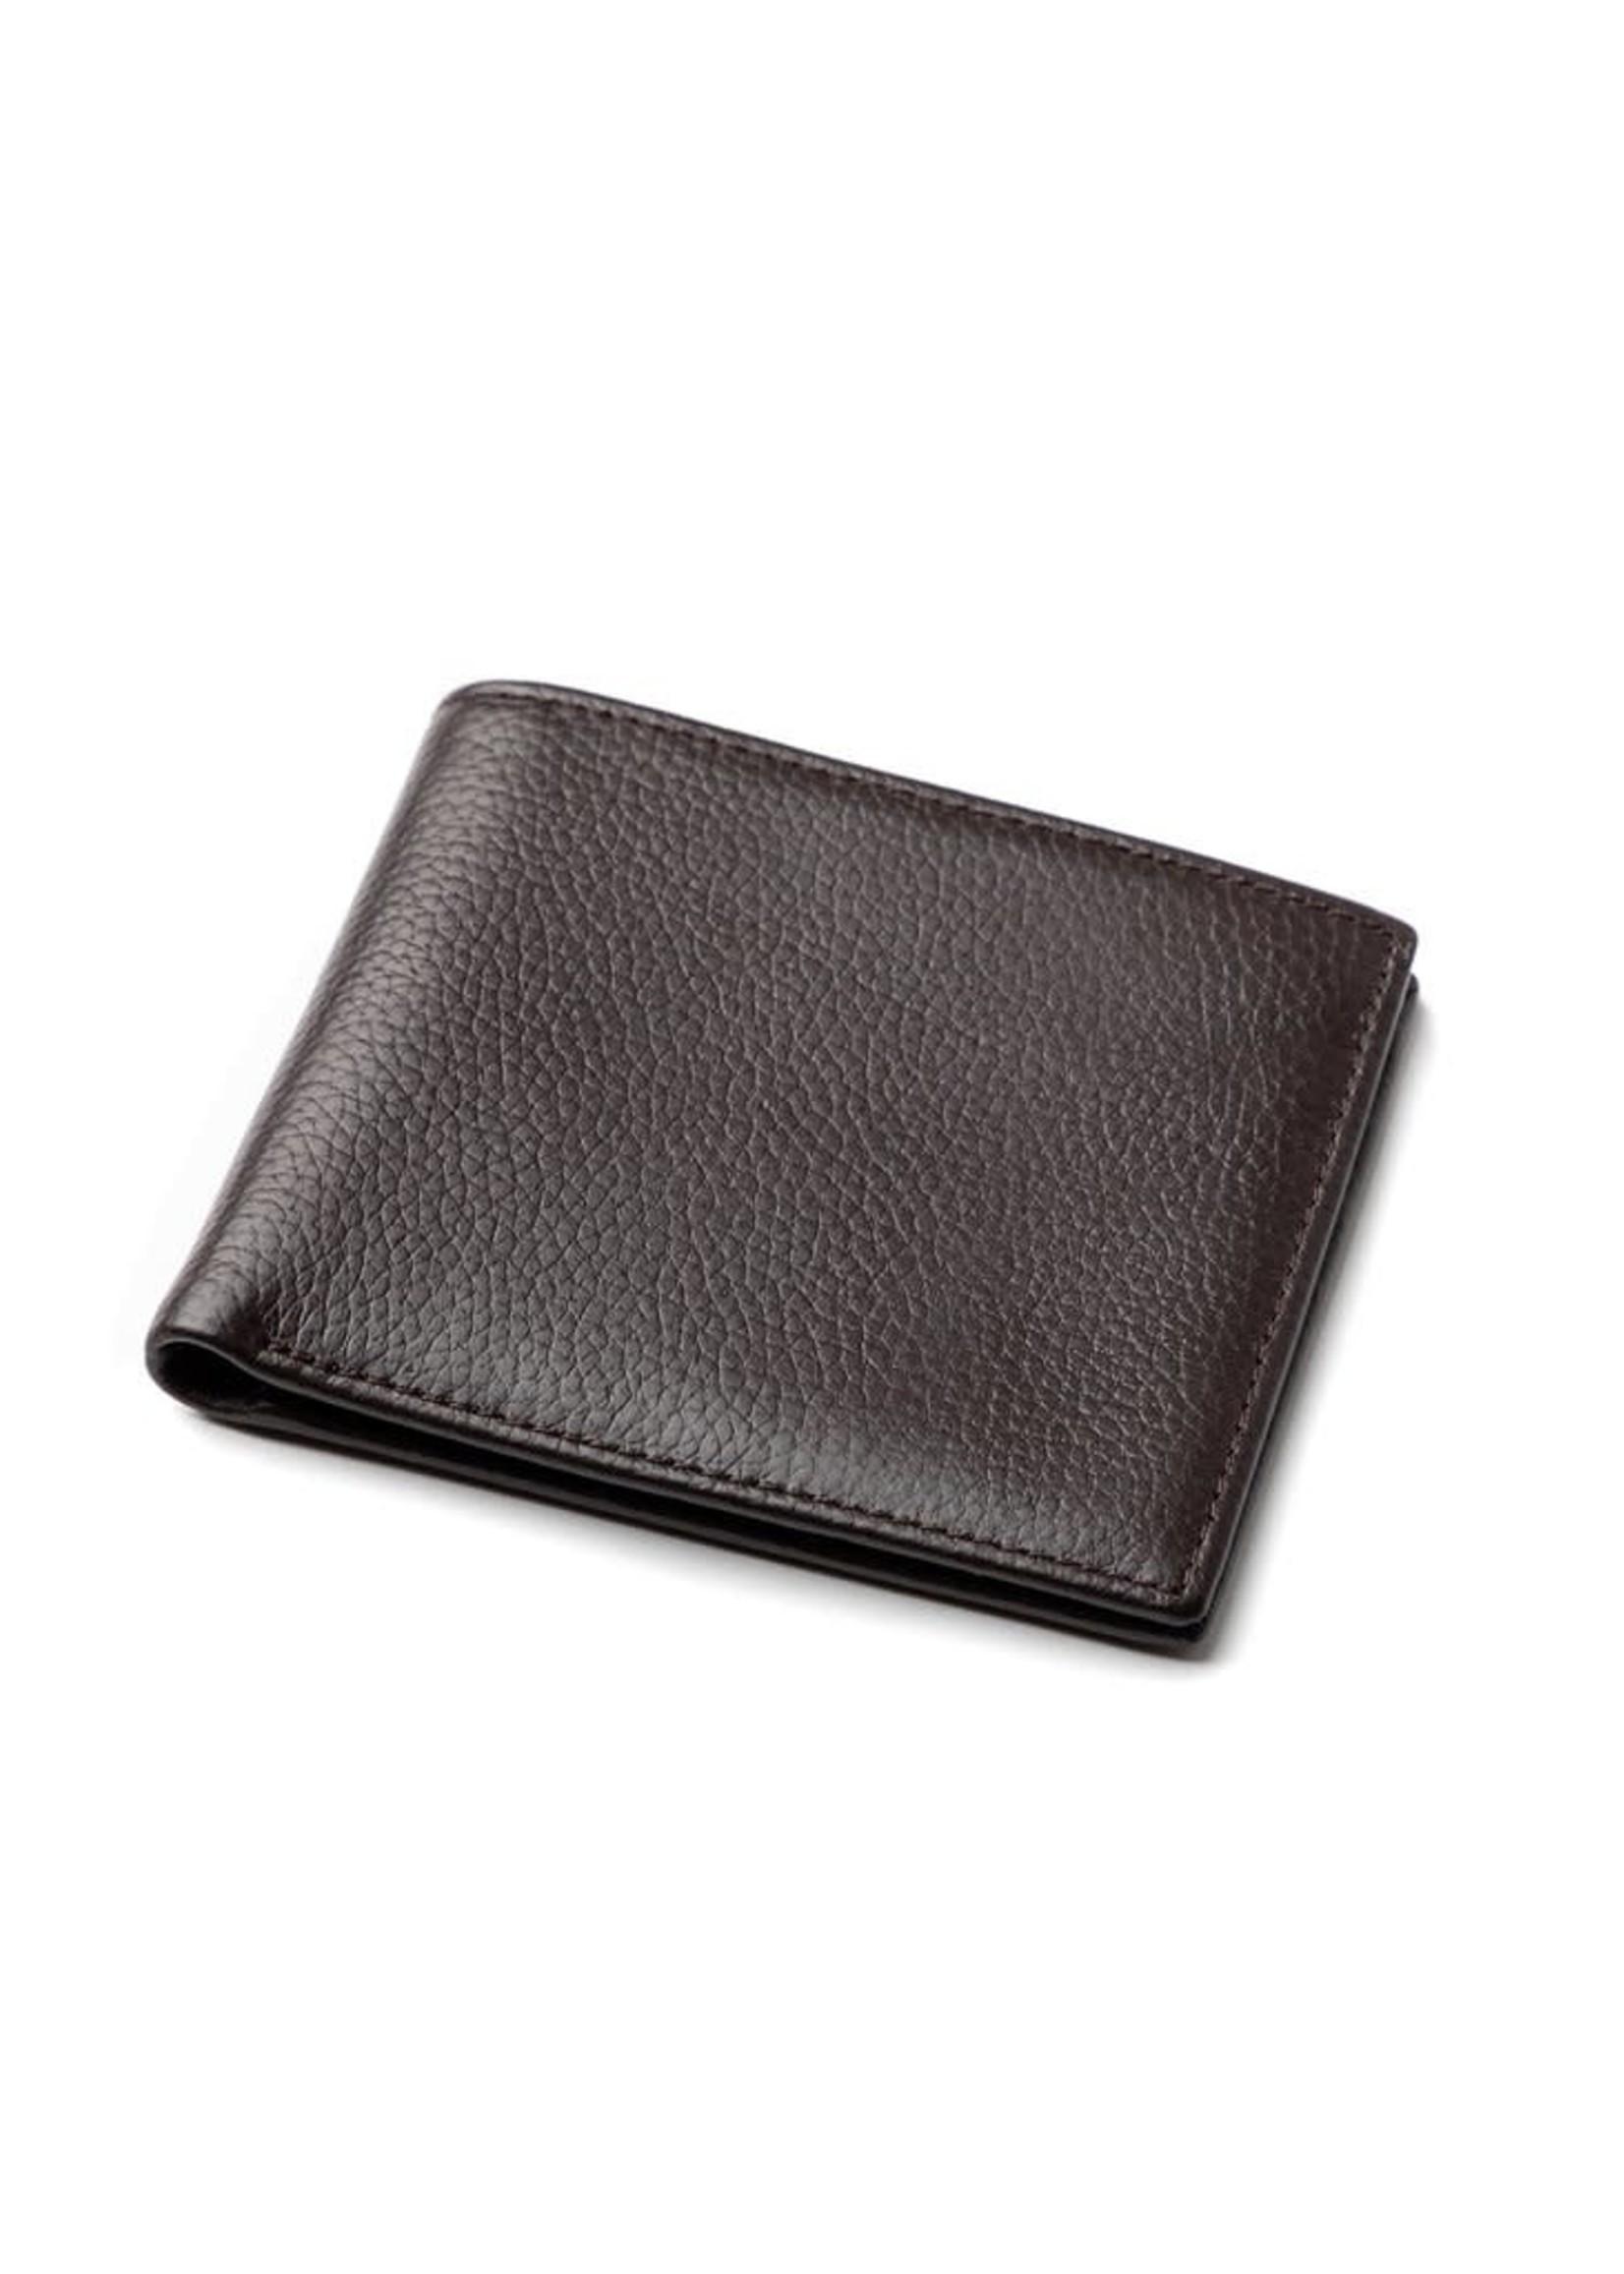 Stanford Genuine Leather Wallet